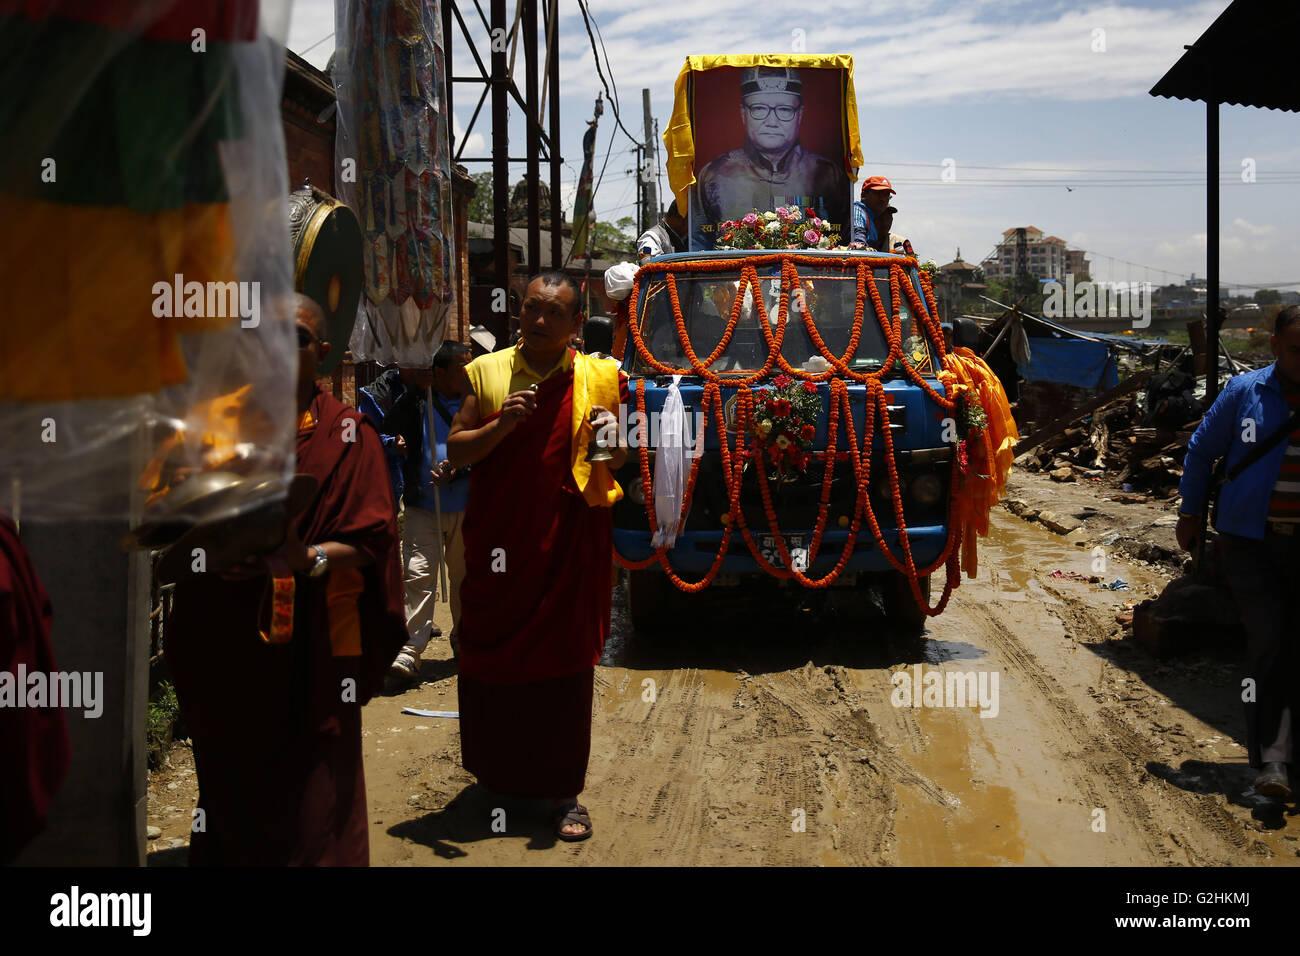 Kathmandu, Nepal. 31st May, 2016. Devotees carry the body of Revered Buddhist abbot Chiniya Lama, Sherab Dorje, - Stock Image